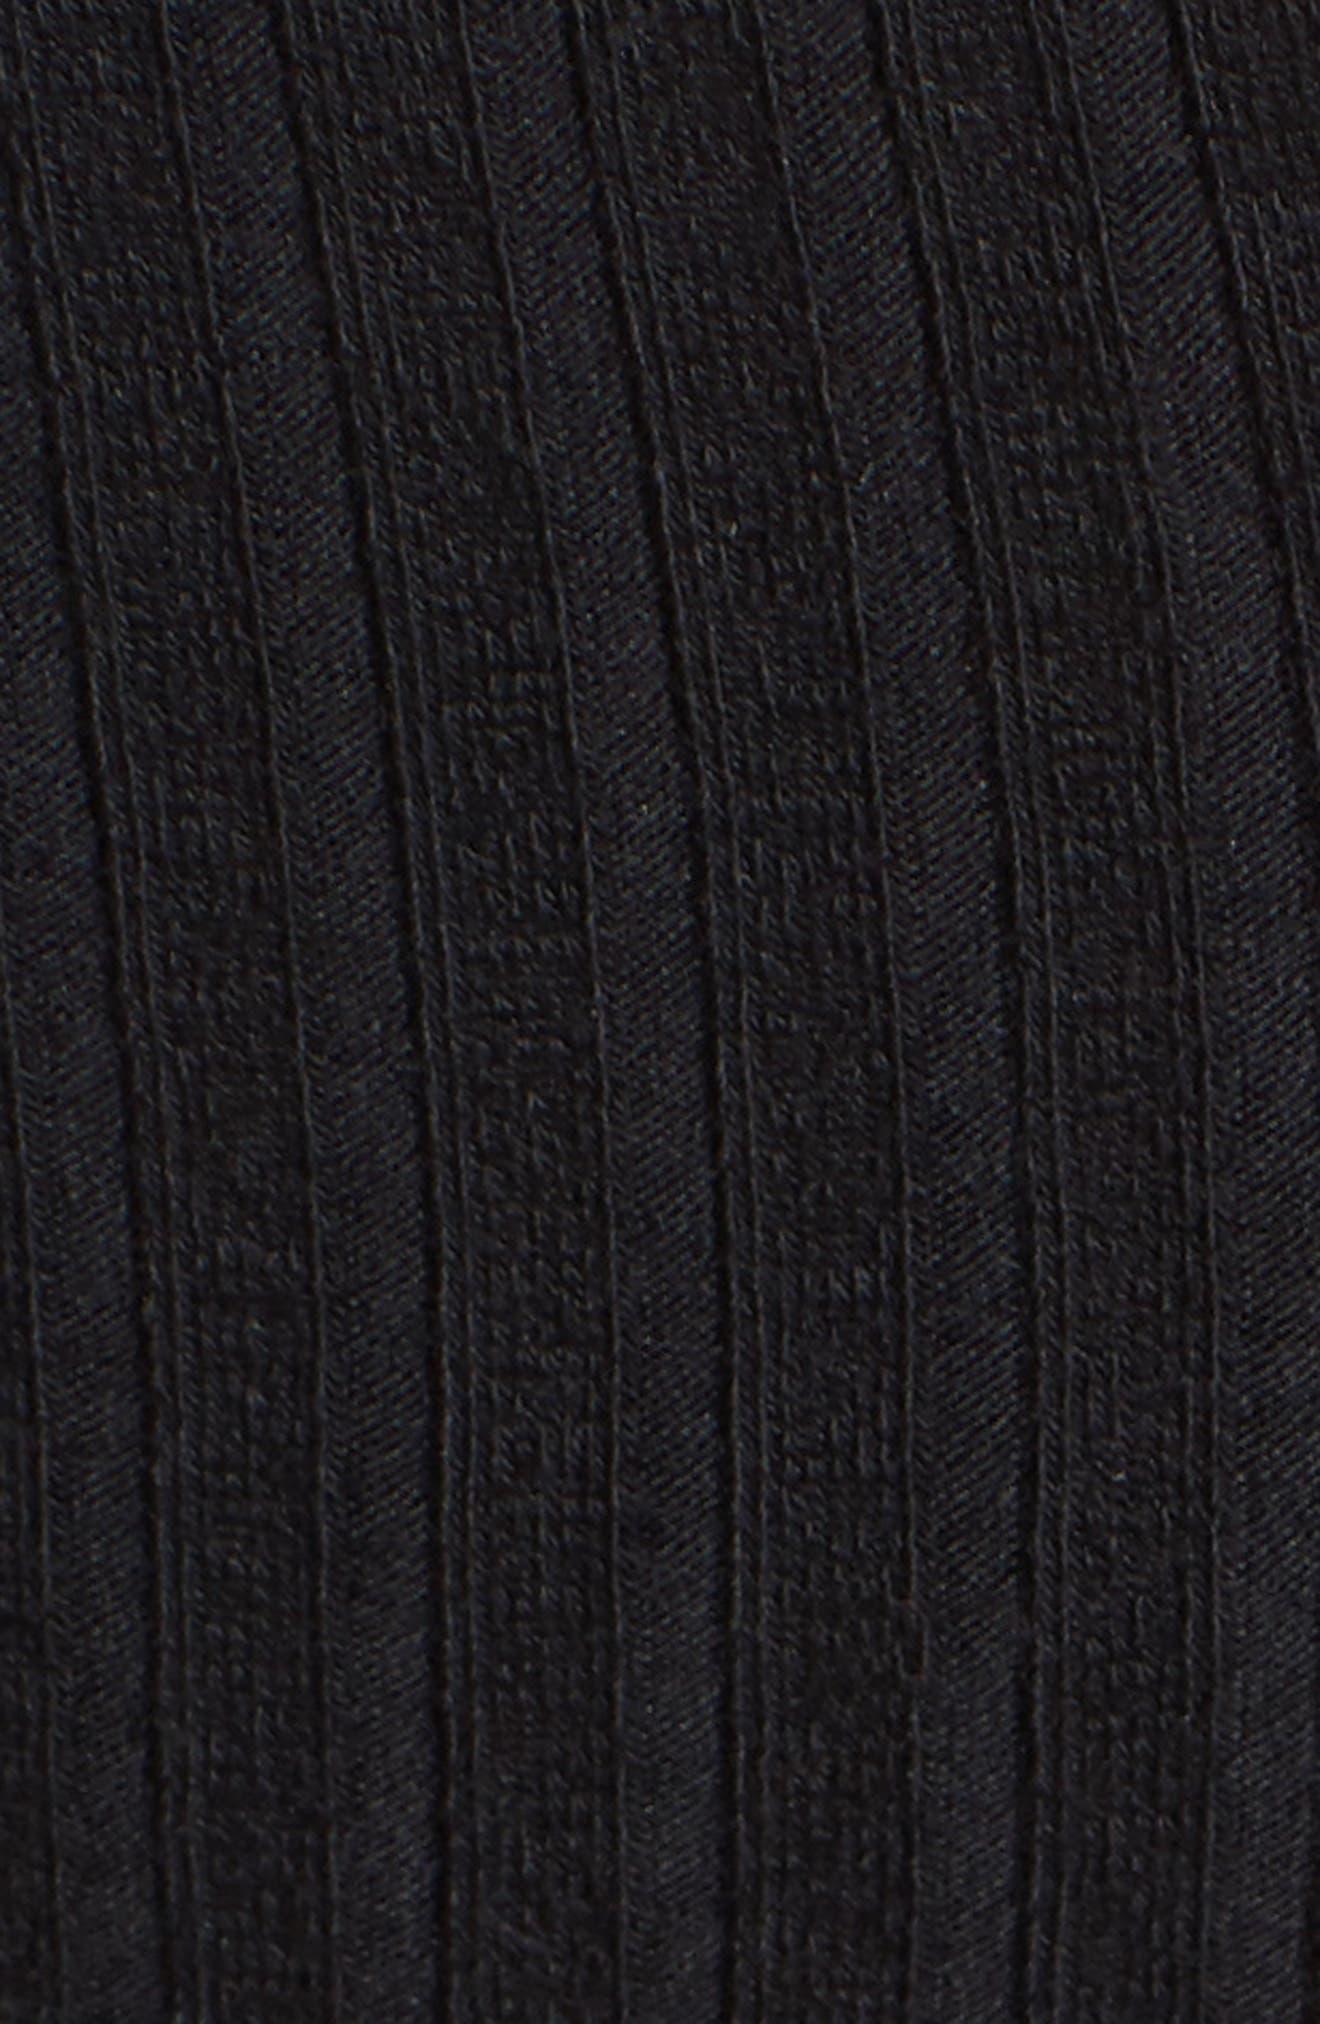 Elbow Cutout Dress,                             Alternate thumbnail 5, color,                             001